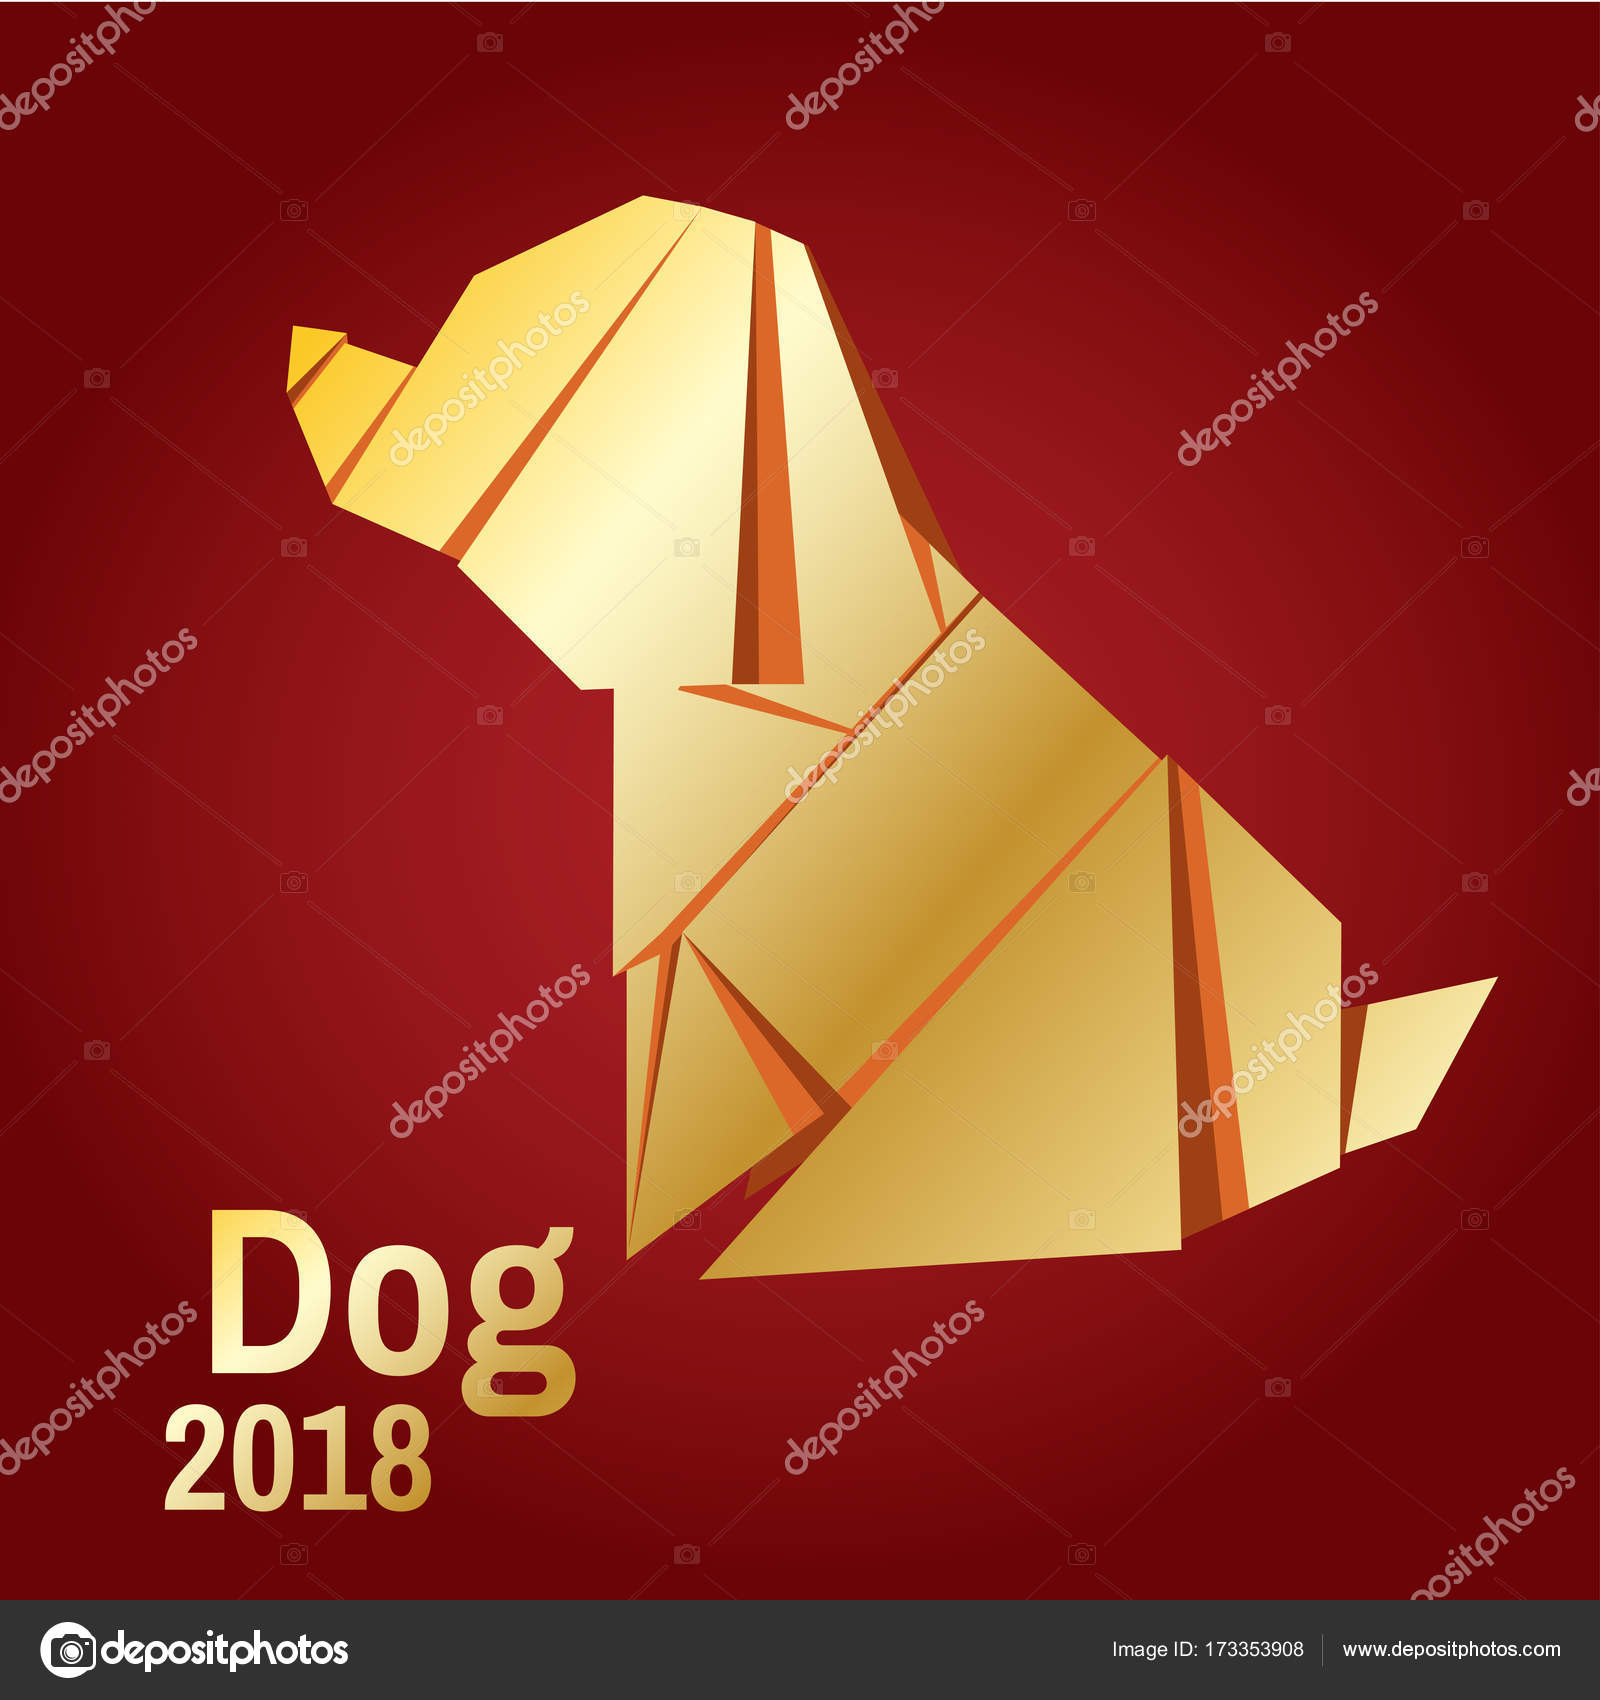 Illustration Of A Golden Origami Dog Stock Vector Bodanochka Diagram Christmas Card In The Style Minimalism Year Stylized Geometric Model Polygonal By